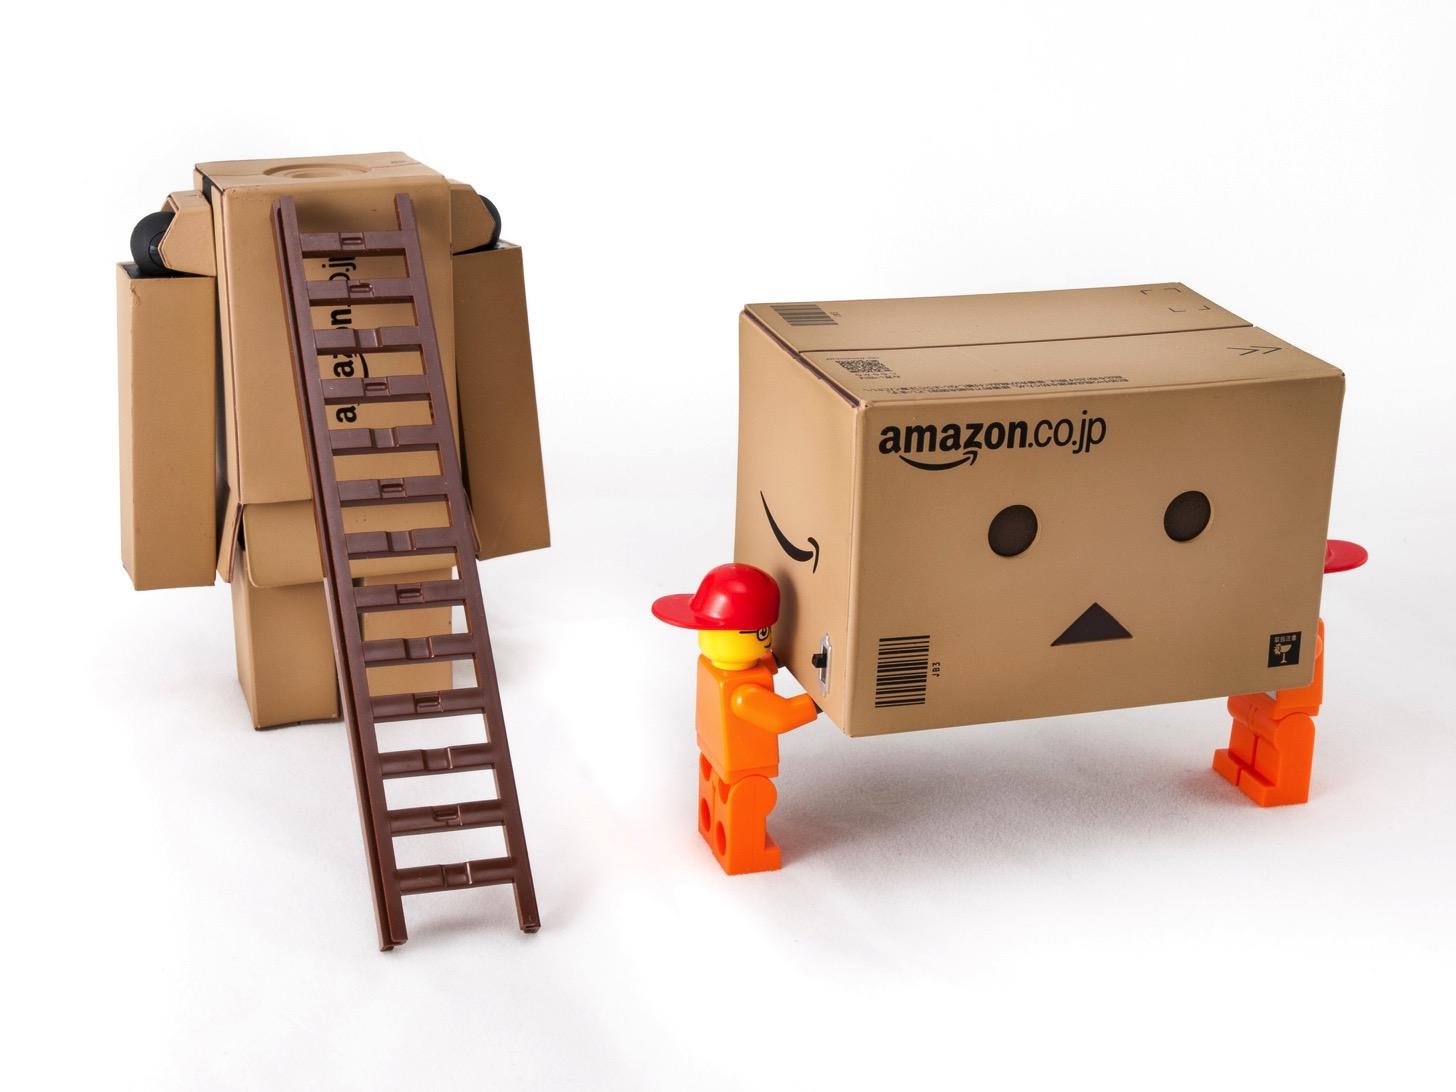 Amazonプライム会員登録のメリットとデメリットのまとめ